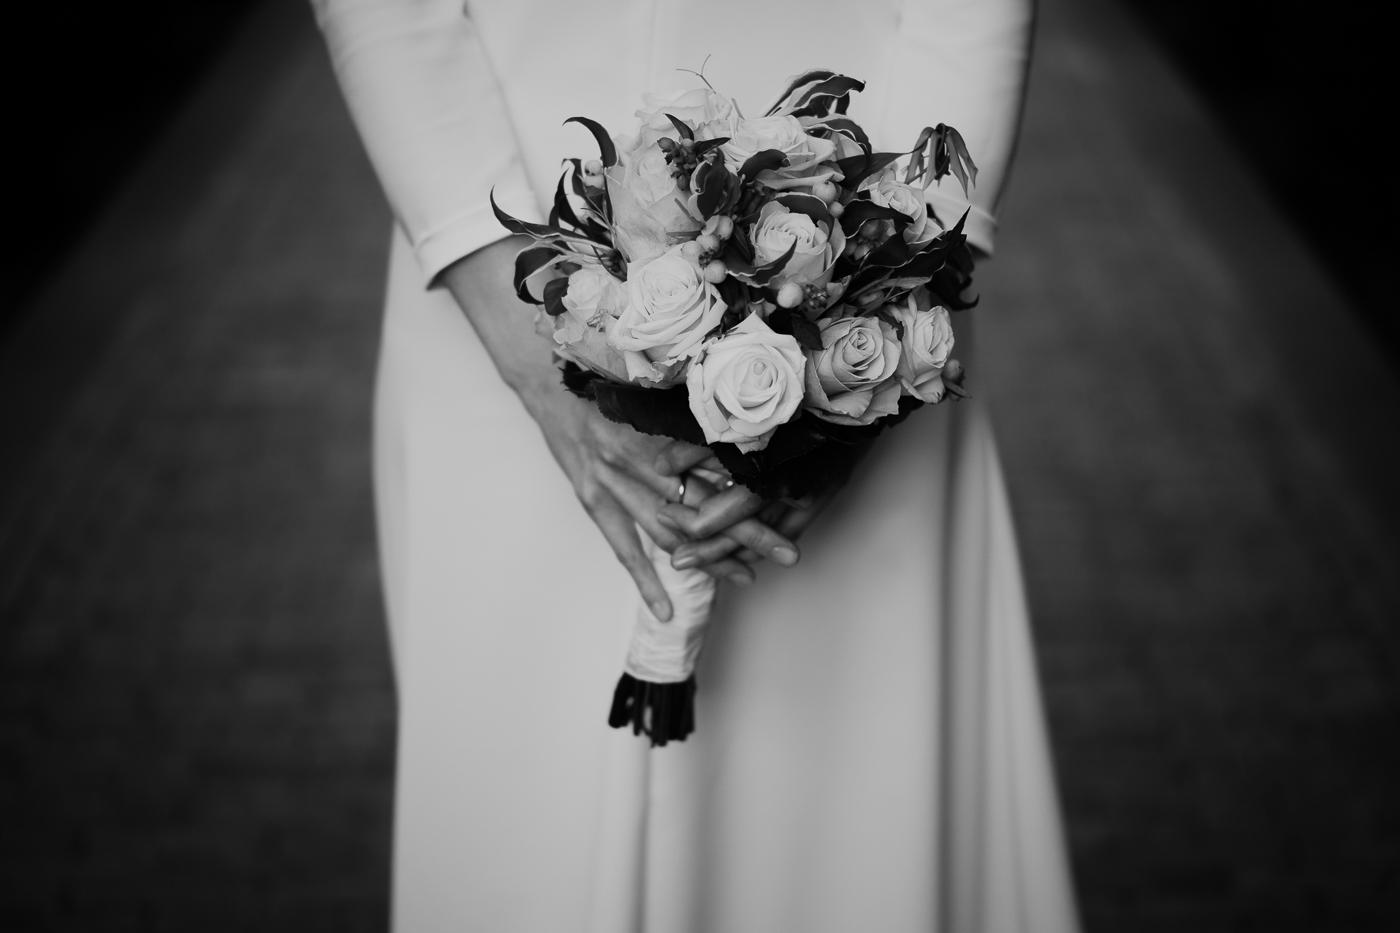 bruidsfotografie-trouwfotograaf-wedding-photographer-amsterdam-James-Jantine-272-2.jpg